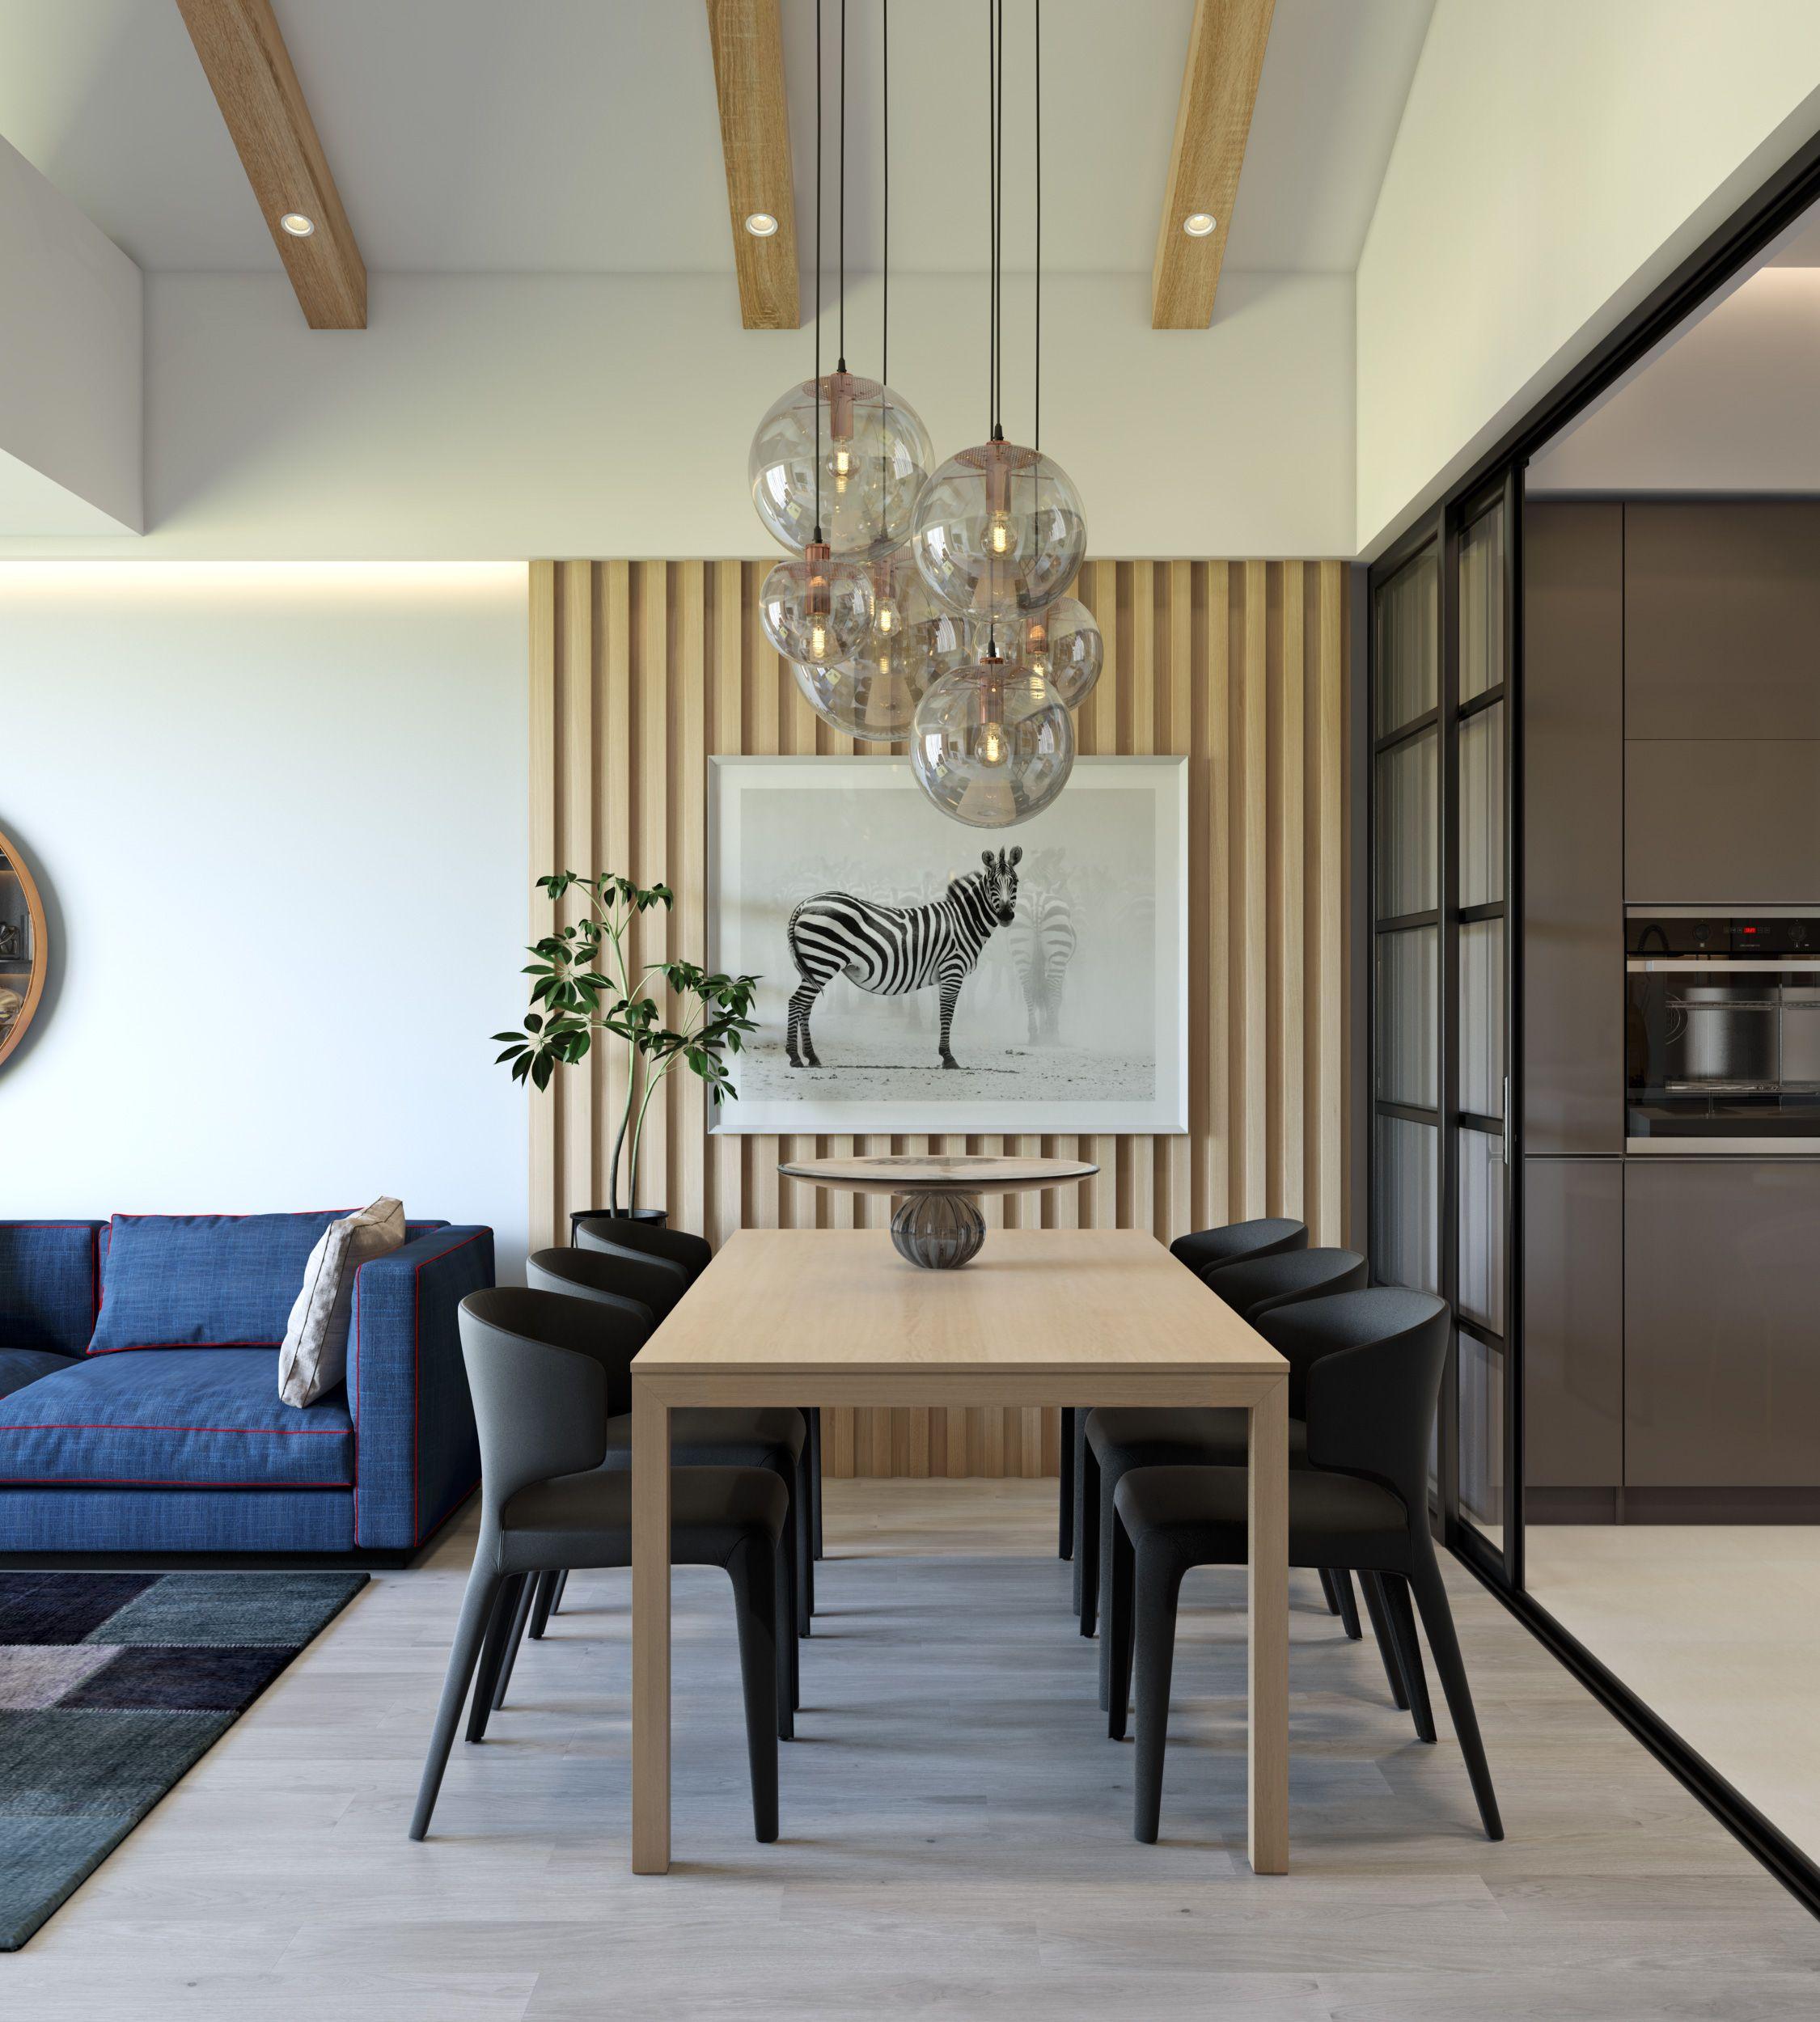 Trendy Dining Room Designs Combined With Modern And: Sala De Jantar Minimalista, Salas De